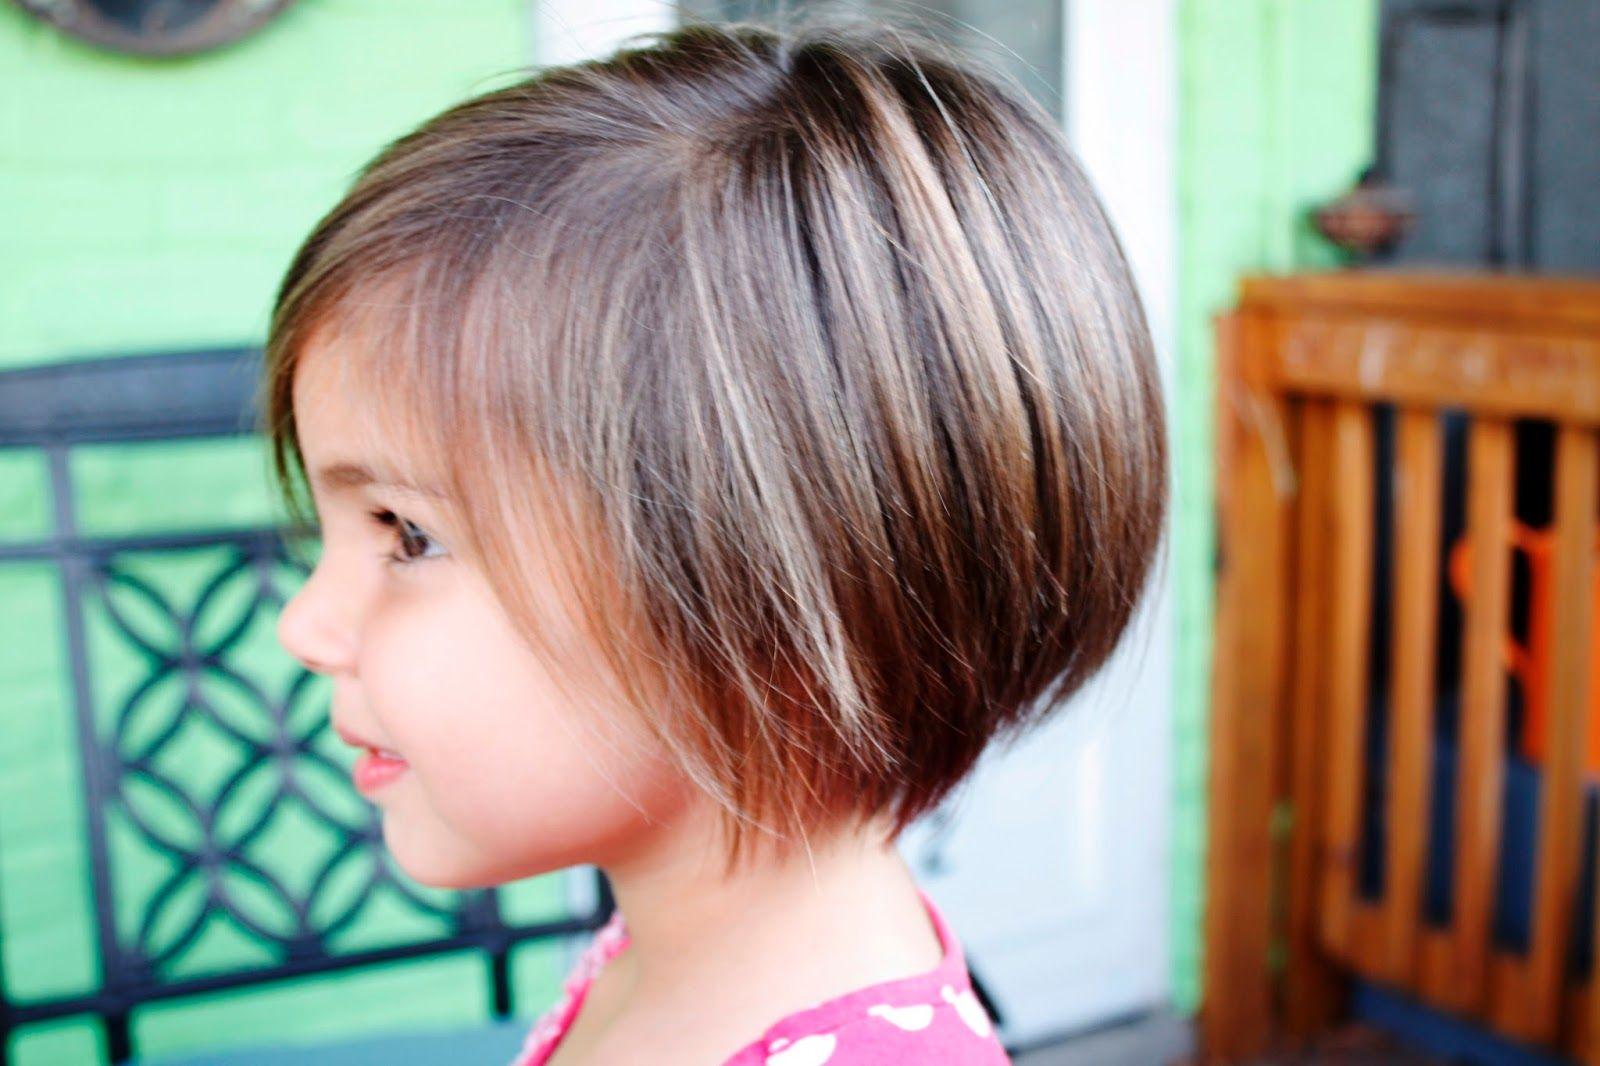 قصات شعر كاريه مدرج قصير للاطفال 2